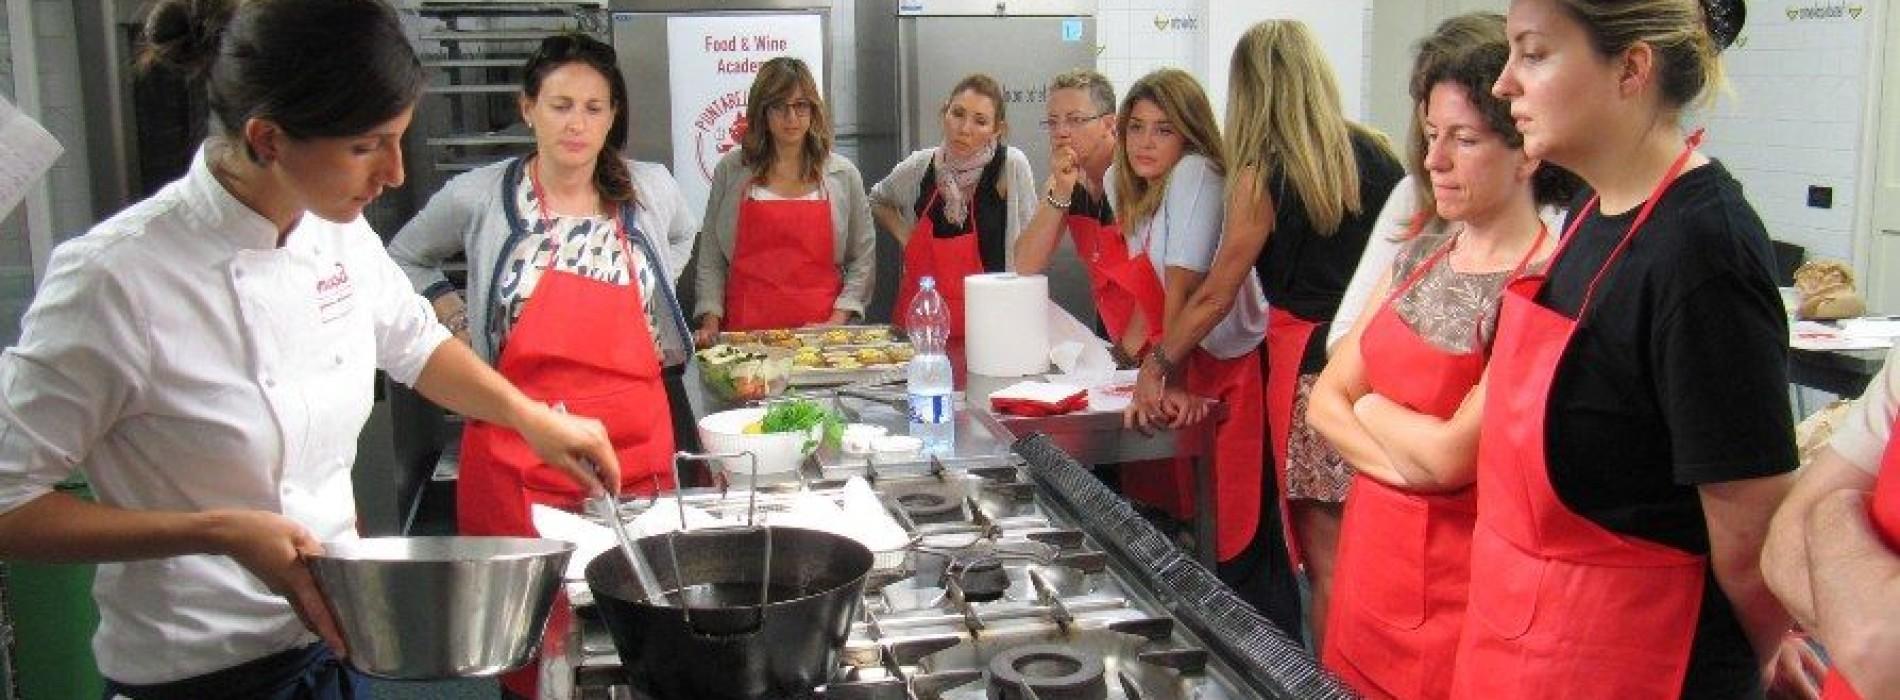 corsi di cucina roma food wine academy puntarella rossa